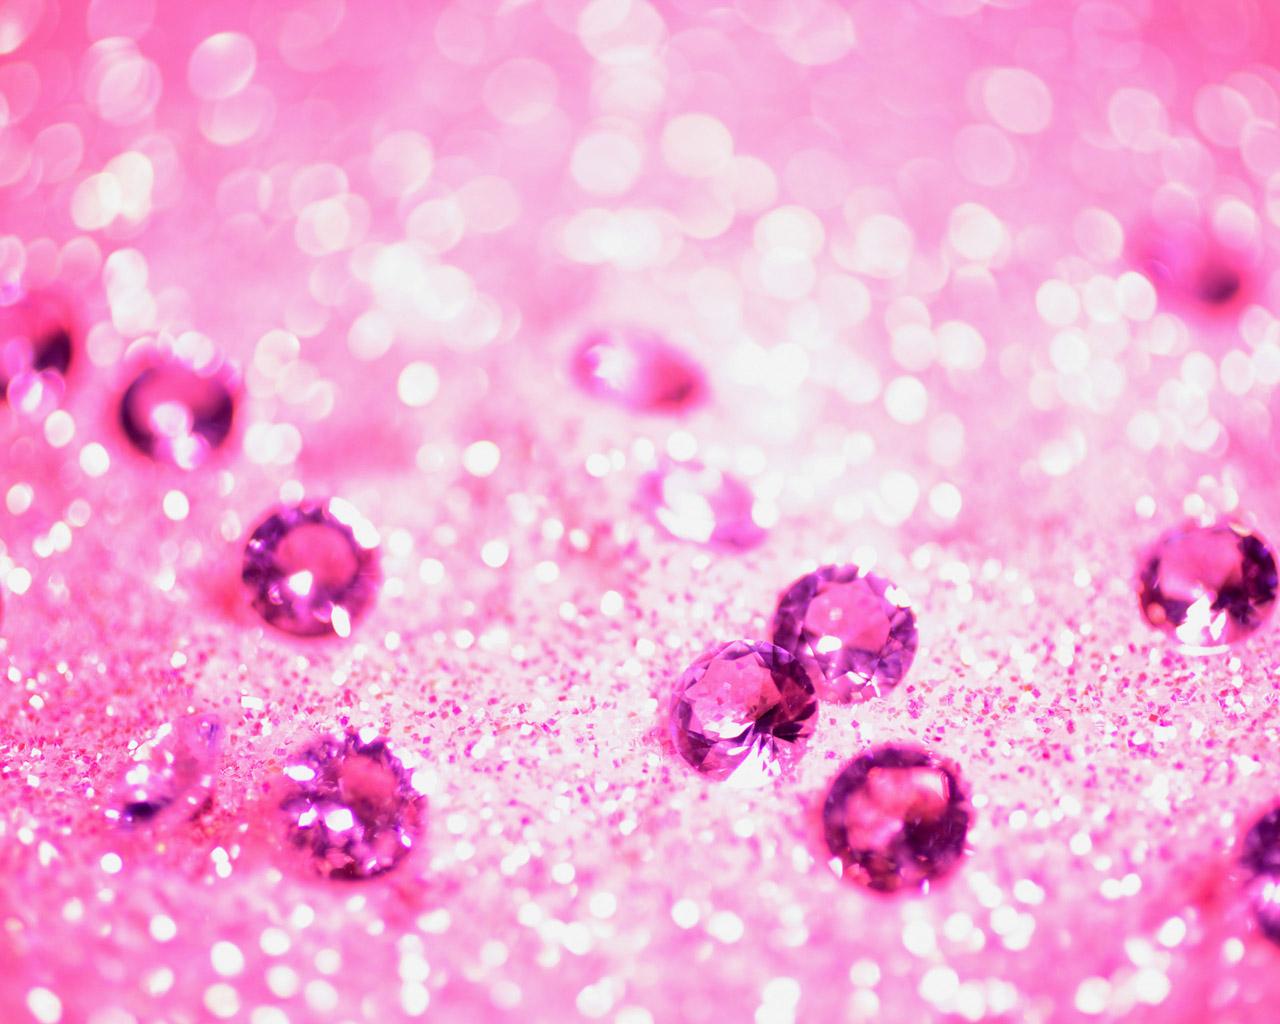 Hot Pink Wallpaper 2 Free Hd